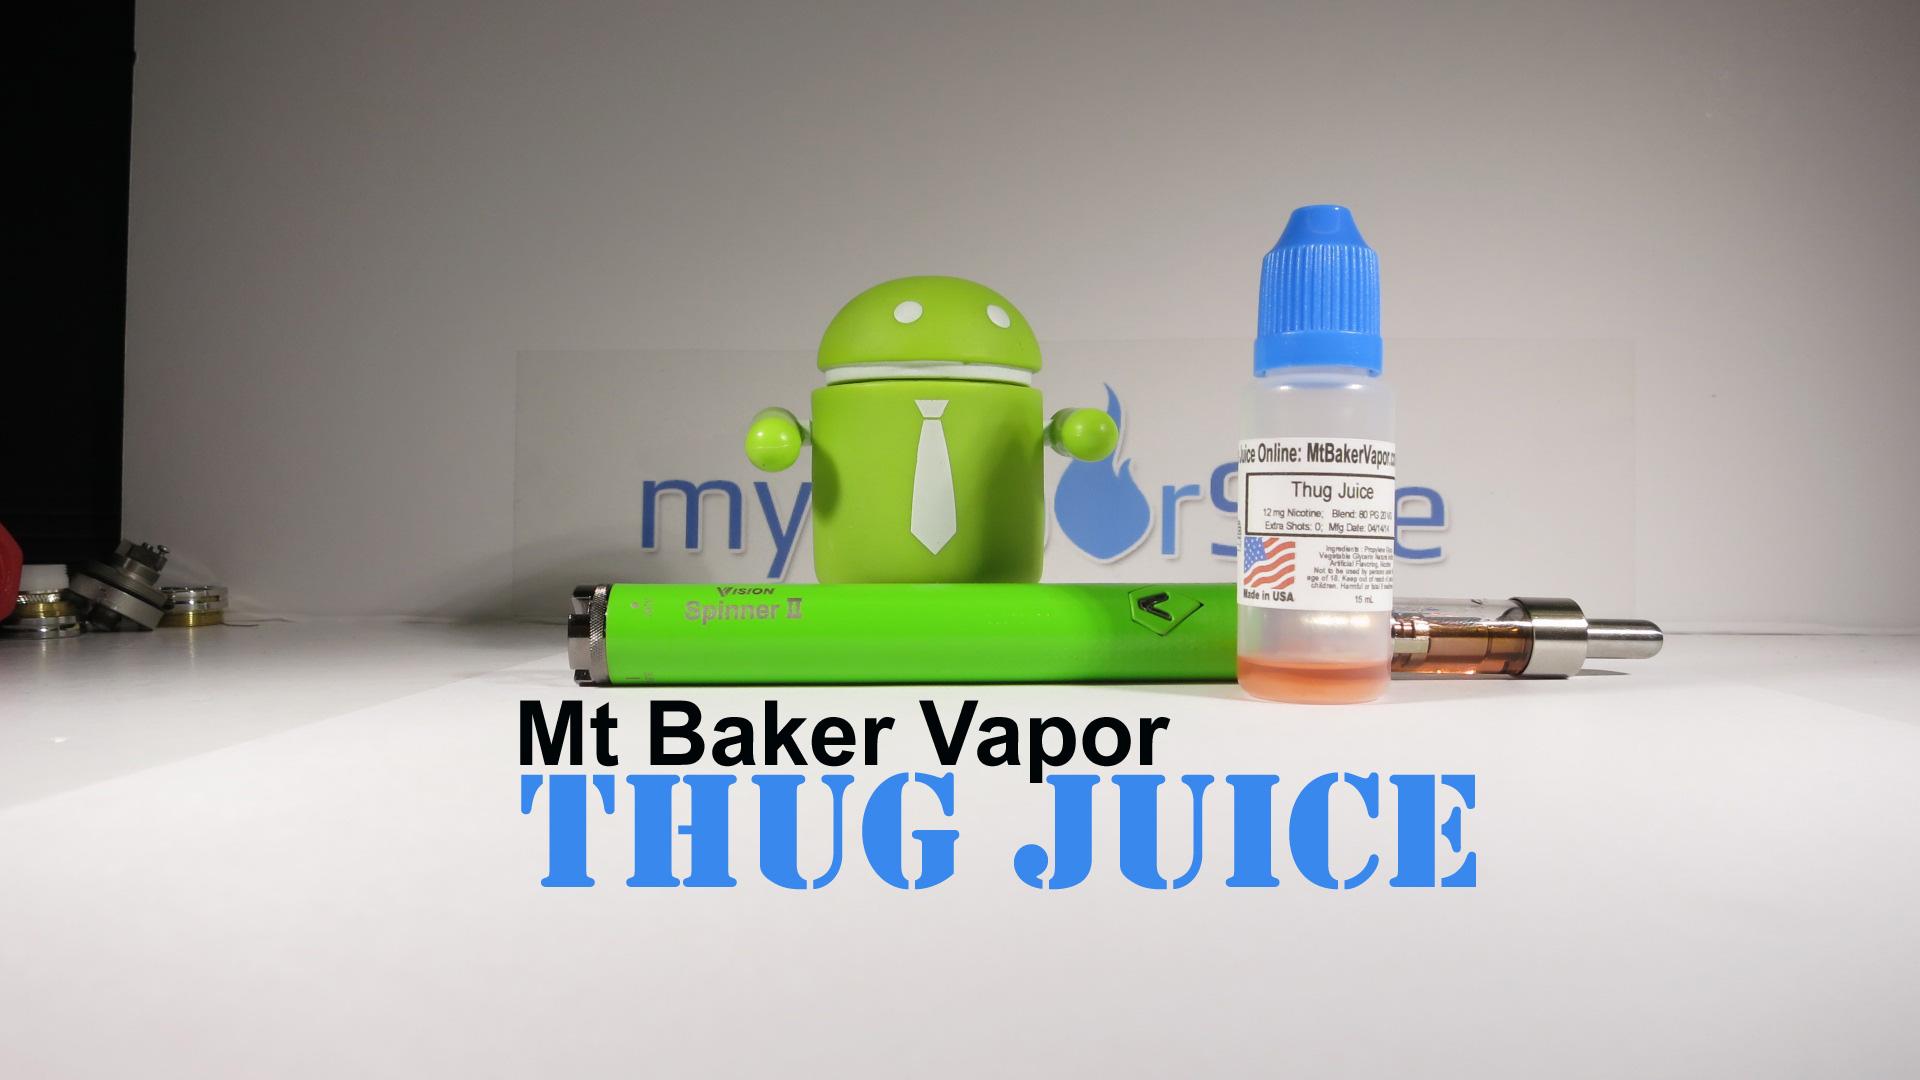 Mt Baker Vapor – Thug Juice E-Liquid Review